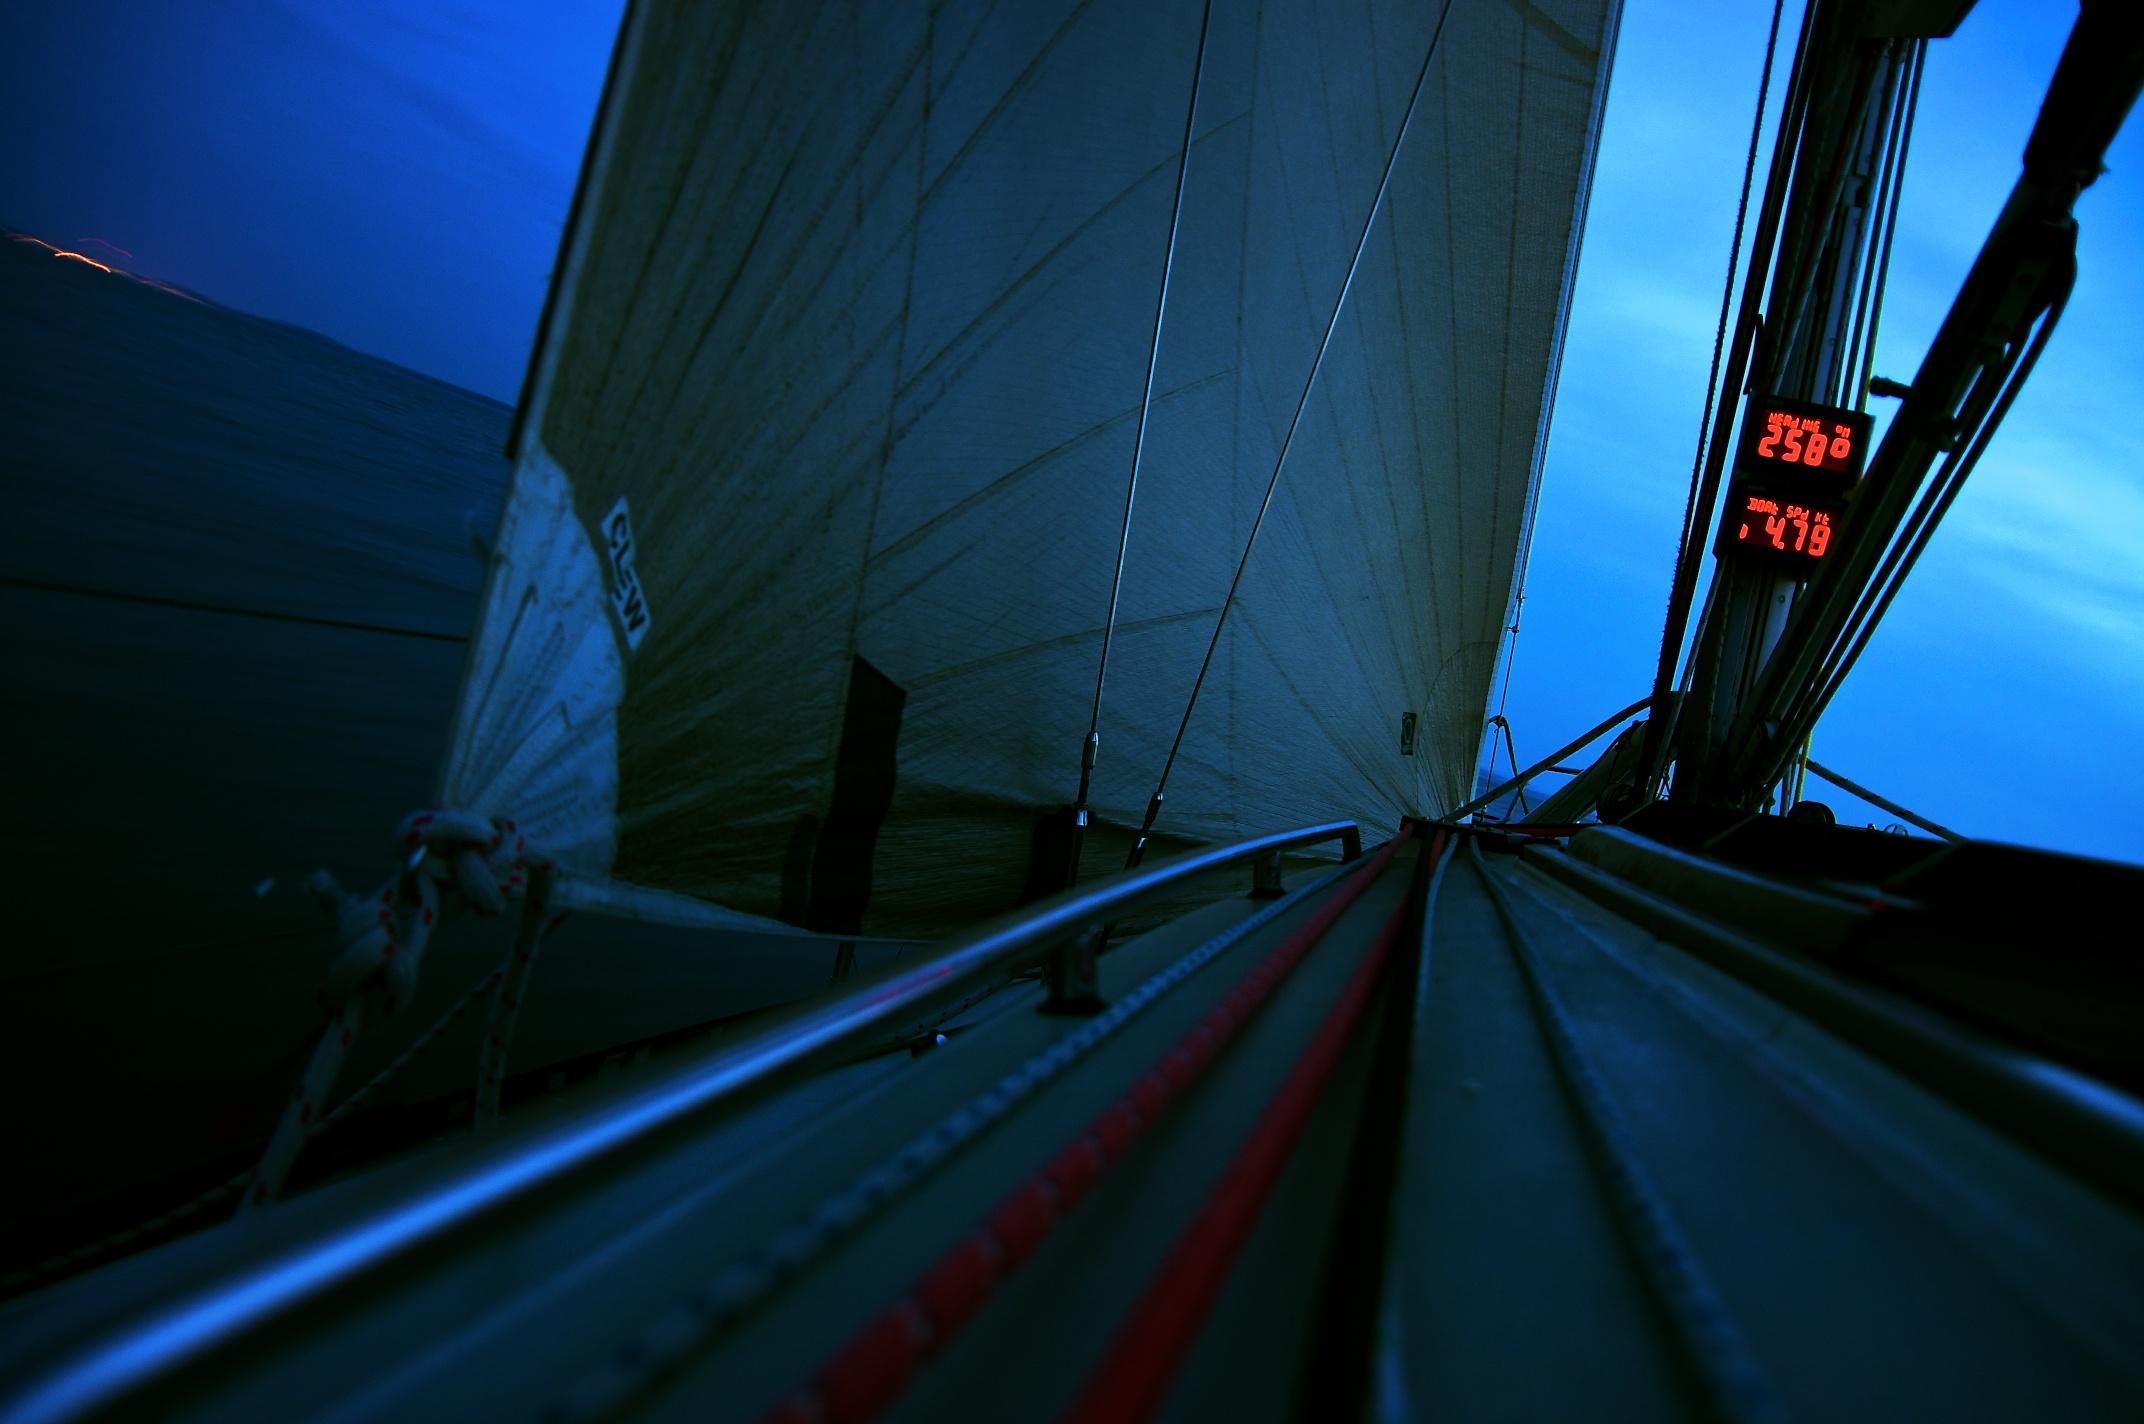 Mittsommer Nacht Segeln 2012 3